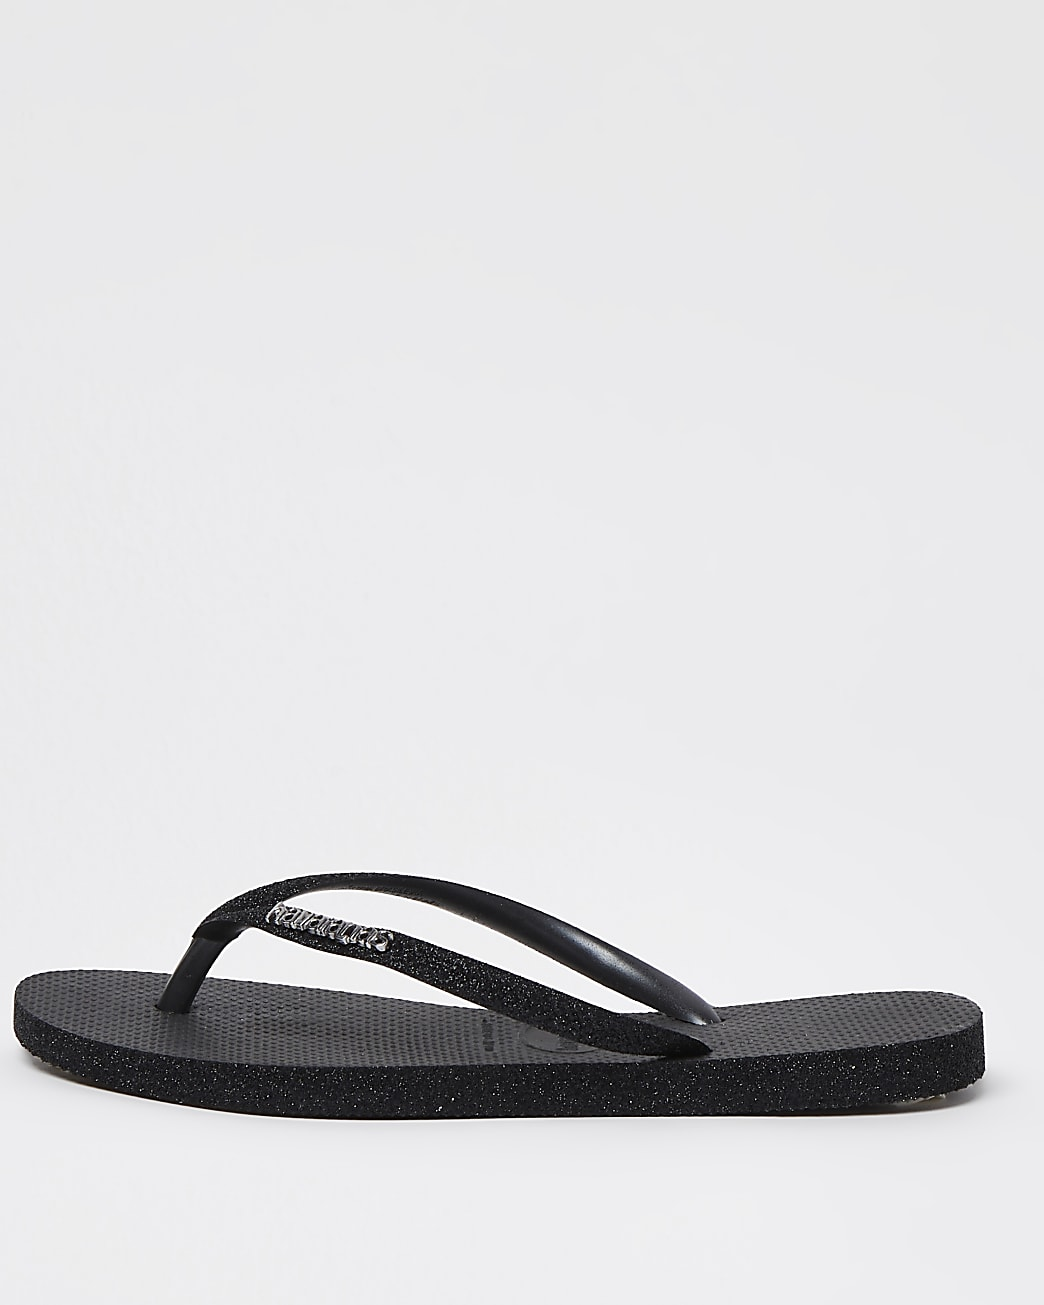 Havaiana black slim sparkle flip flops